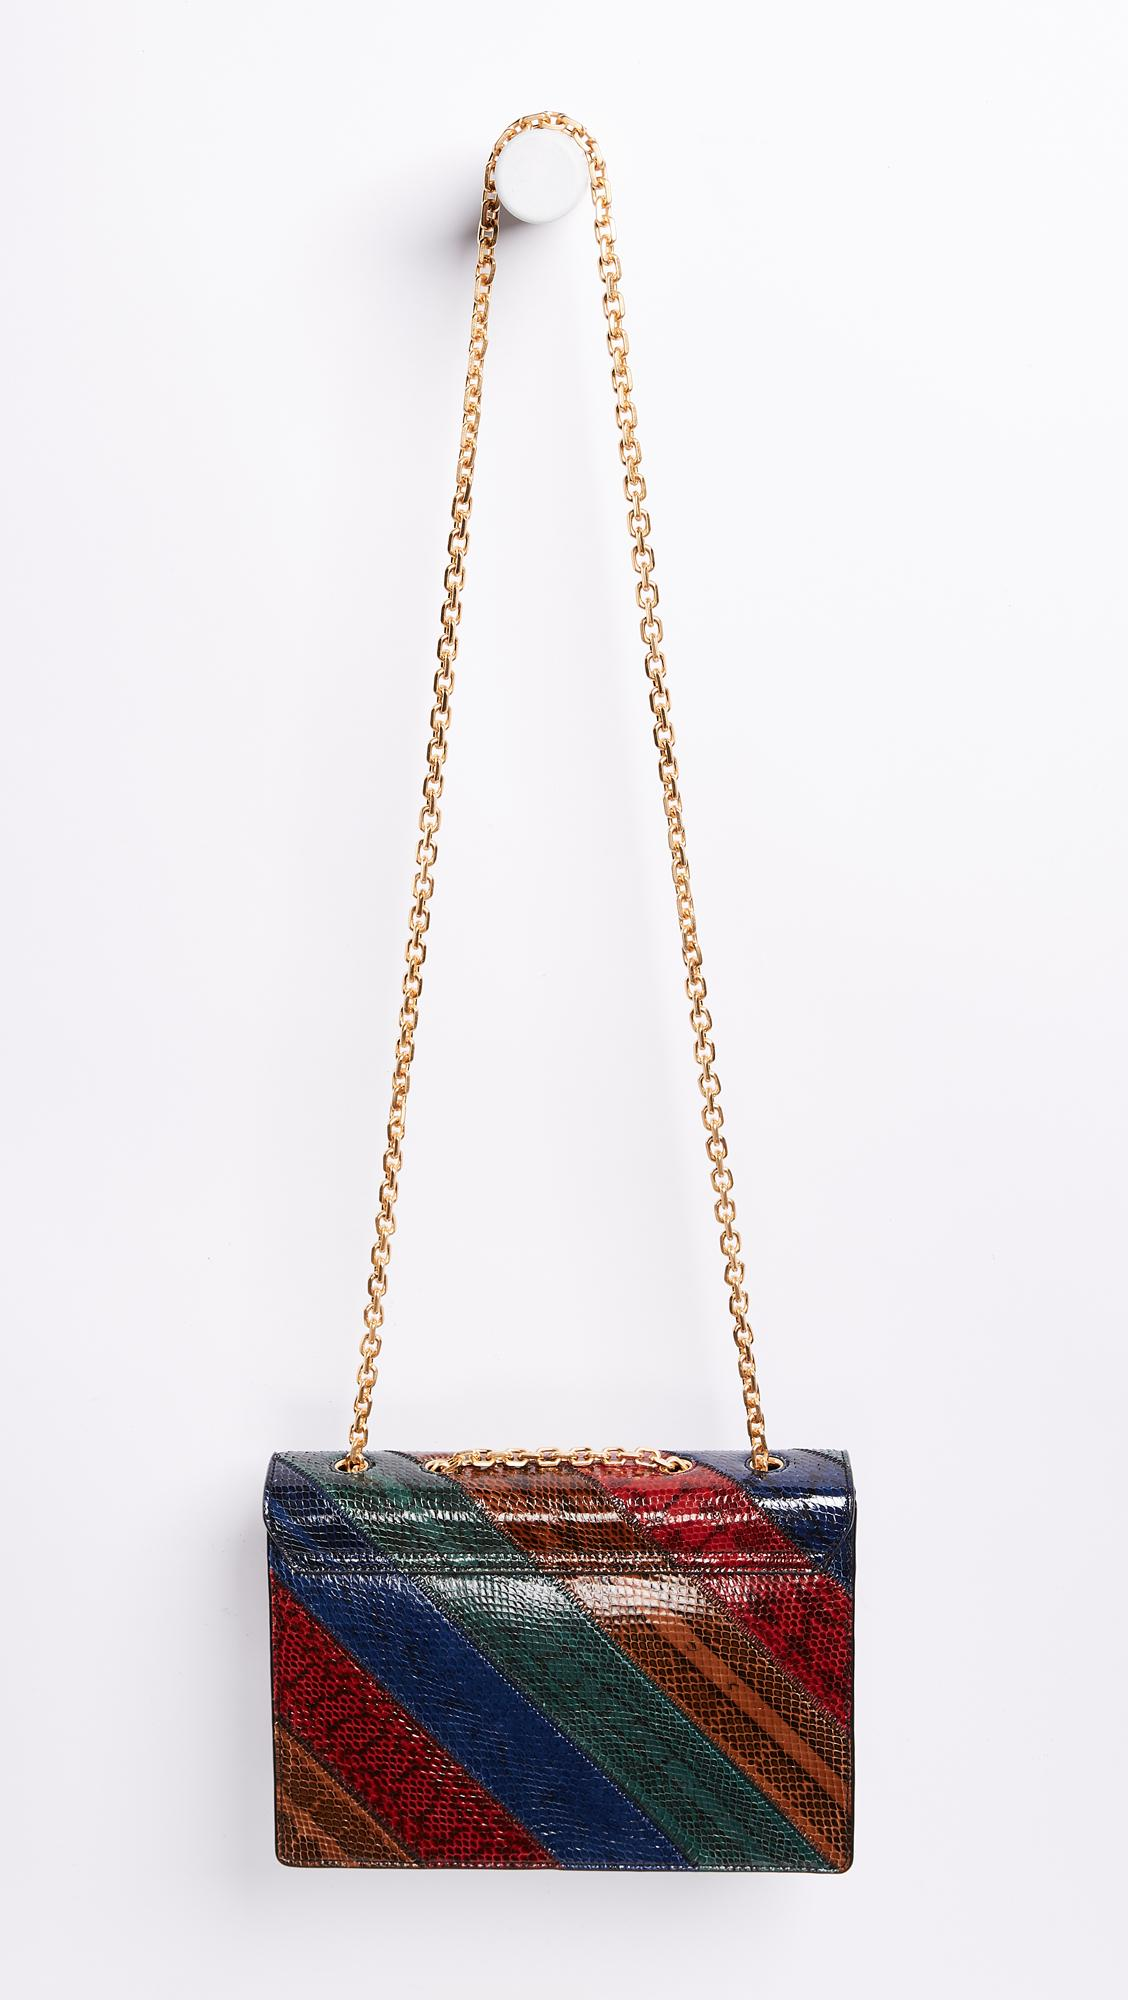 779b4e6c8243 Lyst - Tory Burch Gemini Link Chain Snake Shoulder Bag